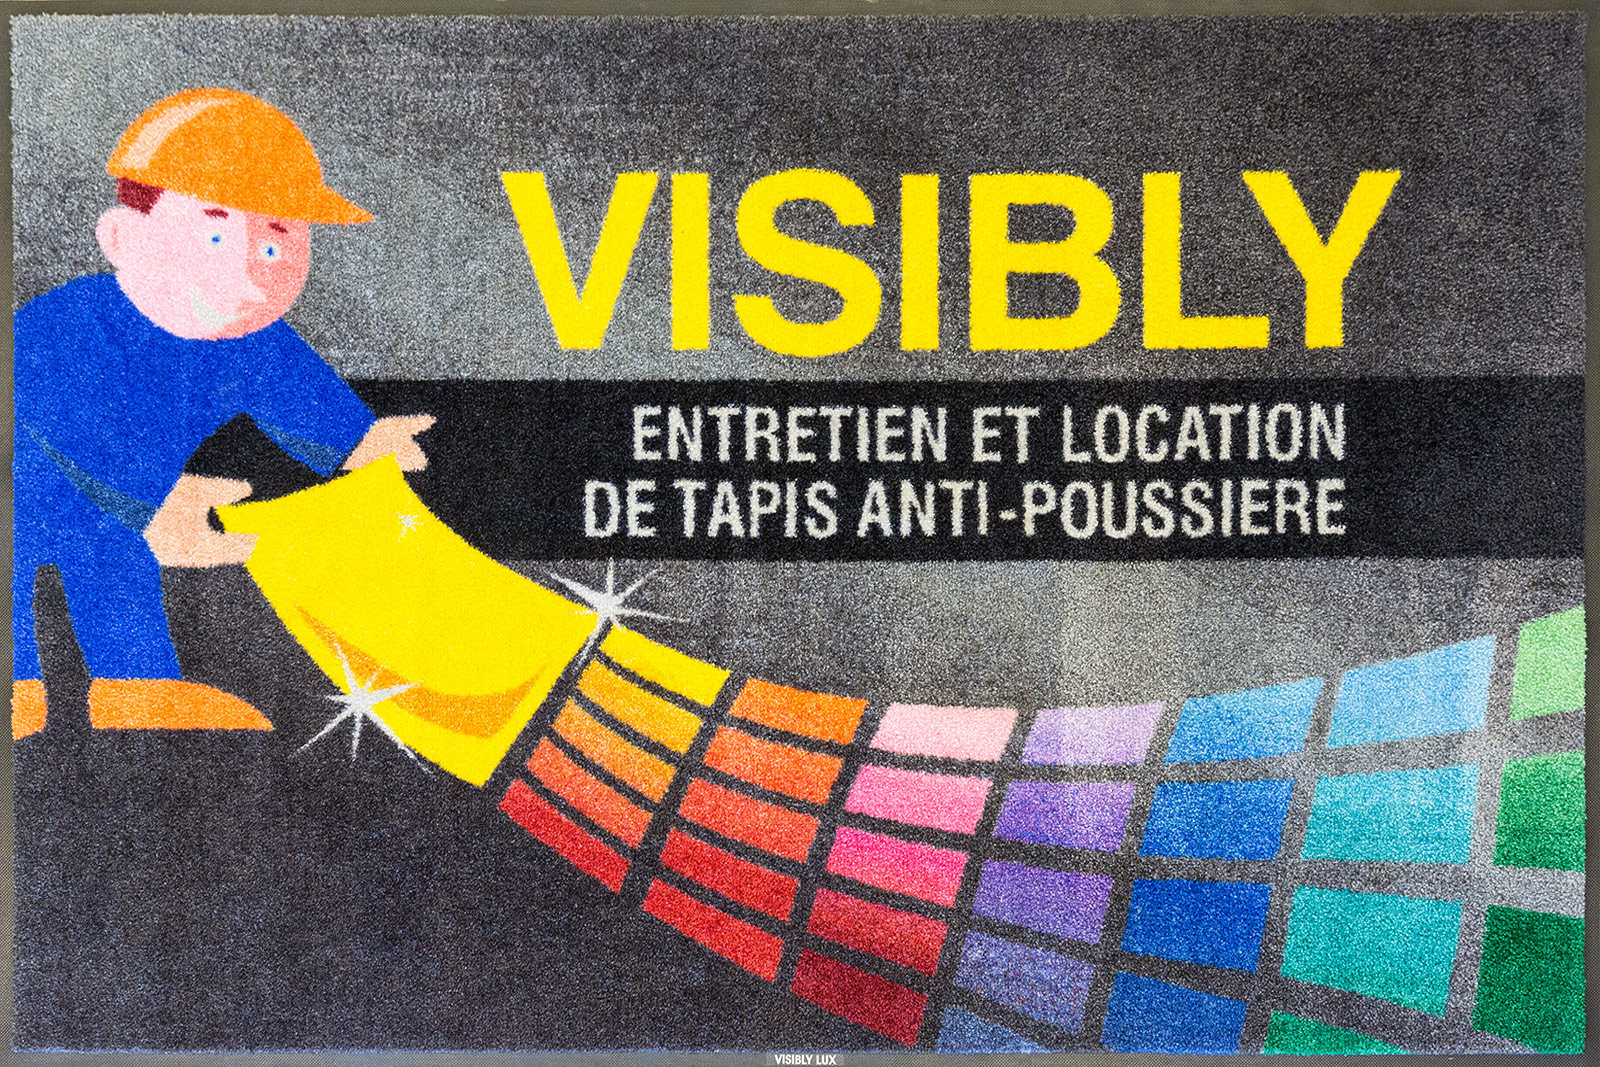 Visibly Tapis Personnalisation , location et entretien tapis